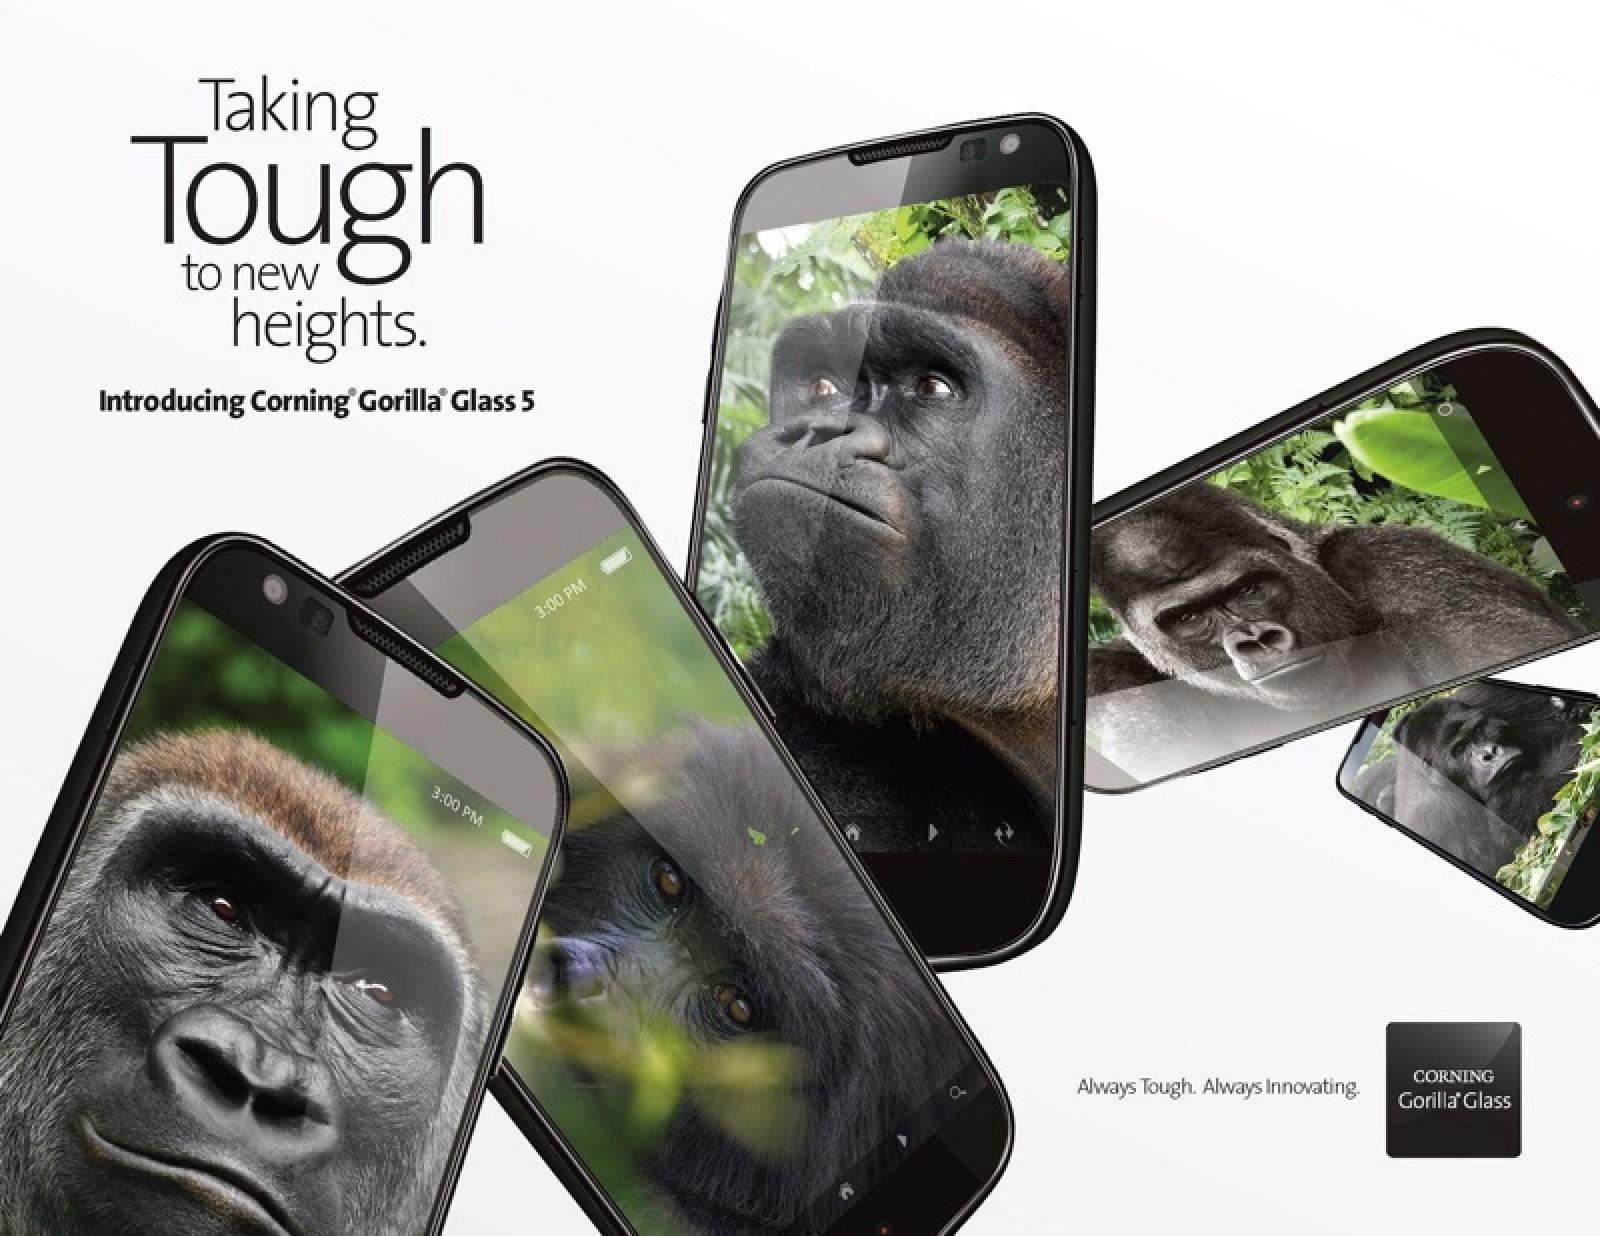 Gorilla Glass 5 resiste caídas de hasta 1.6 metros